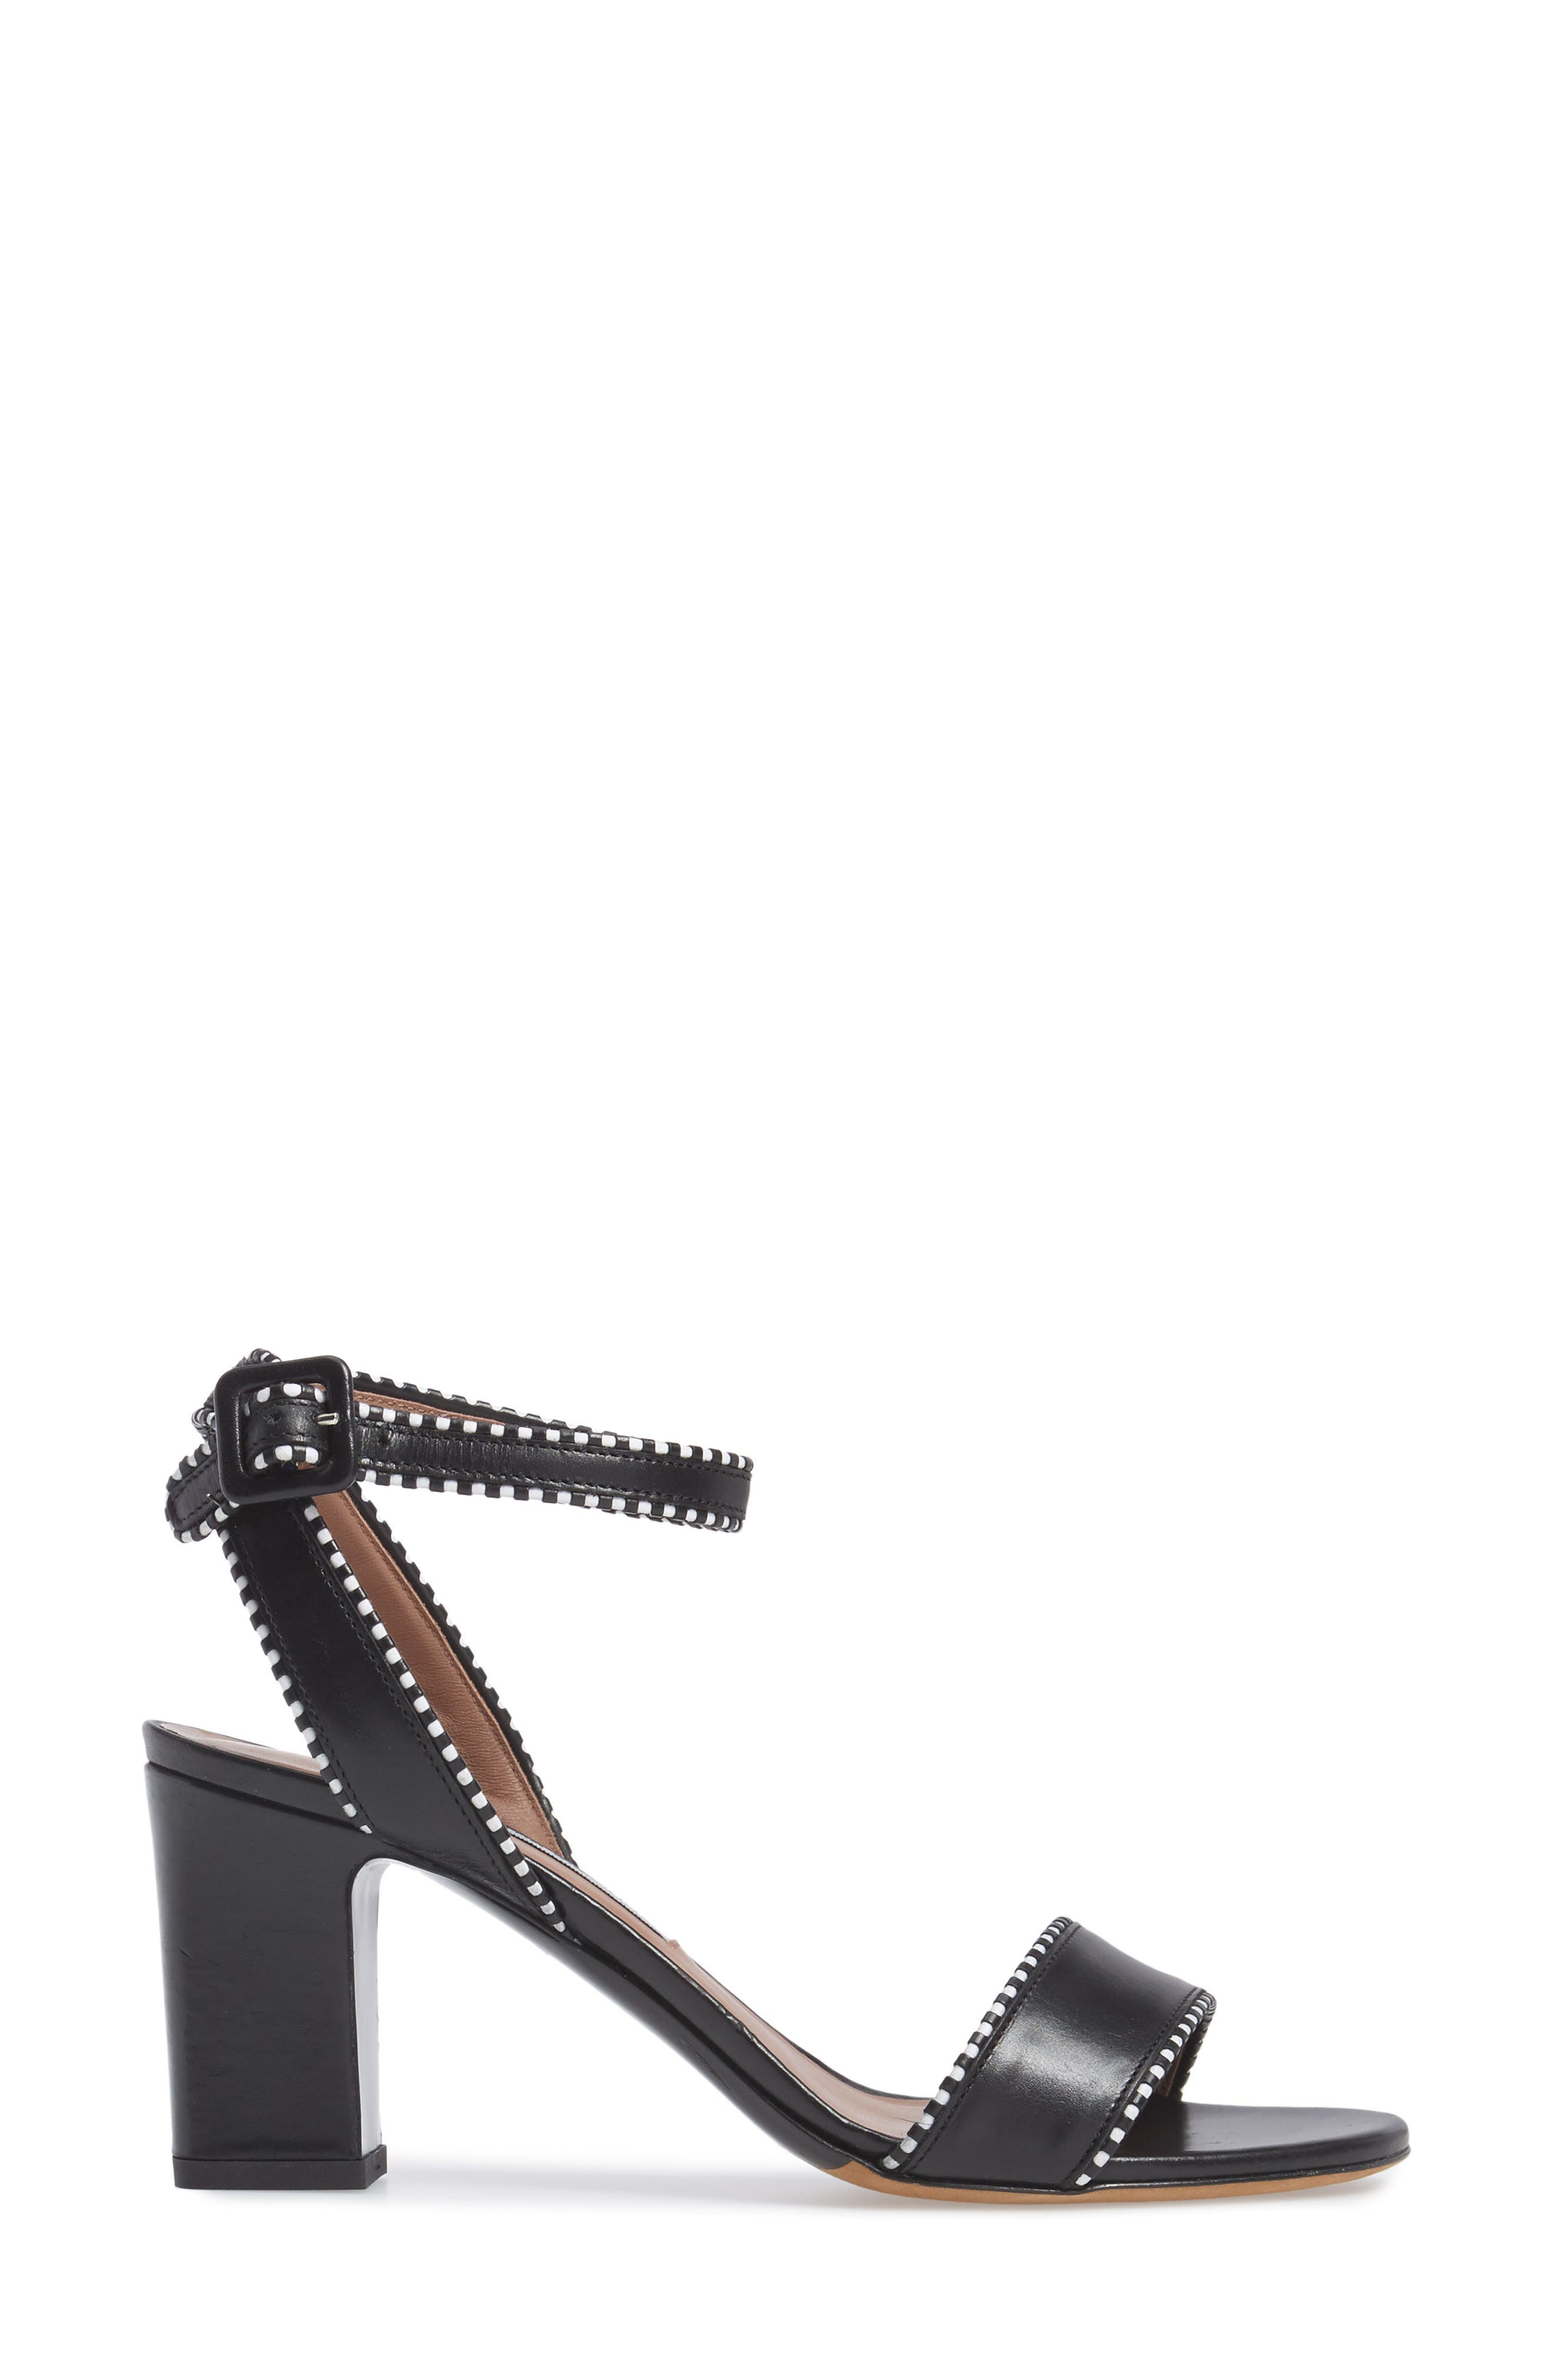 Leticia Profilo Ankle Strap Sandal,                             Alternate thumbnail 3, color,                             Black